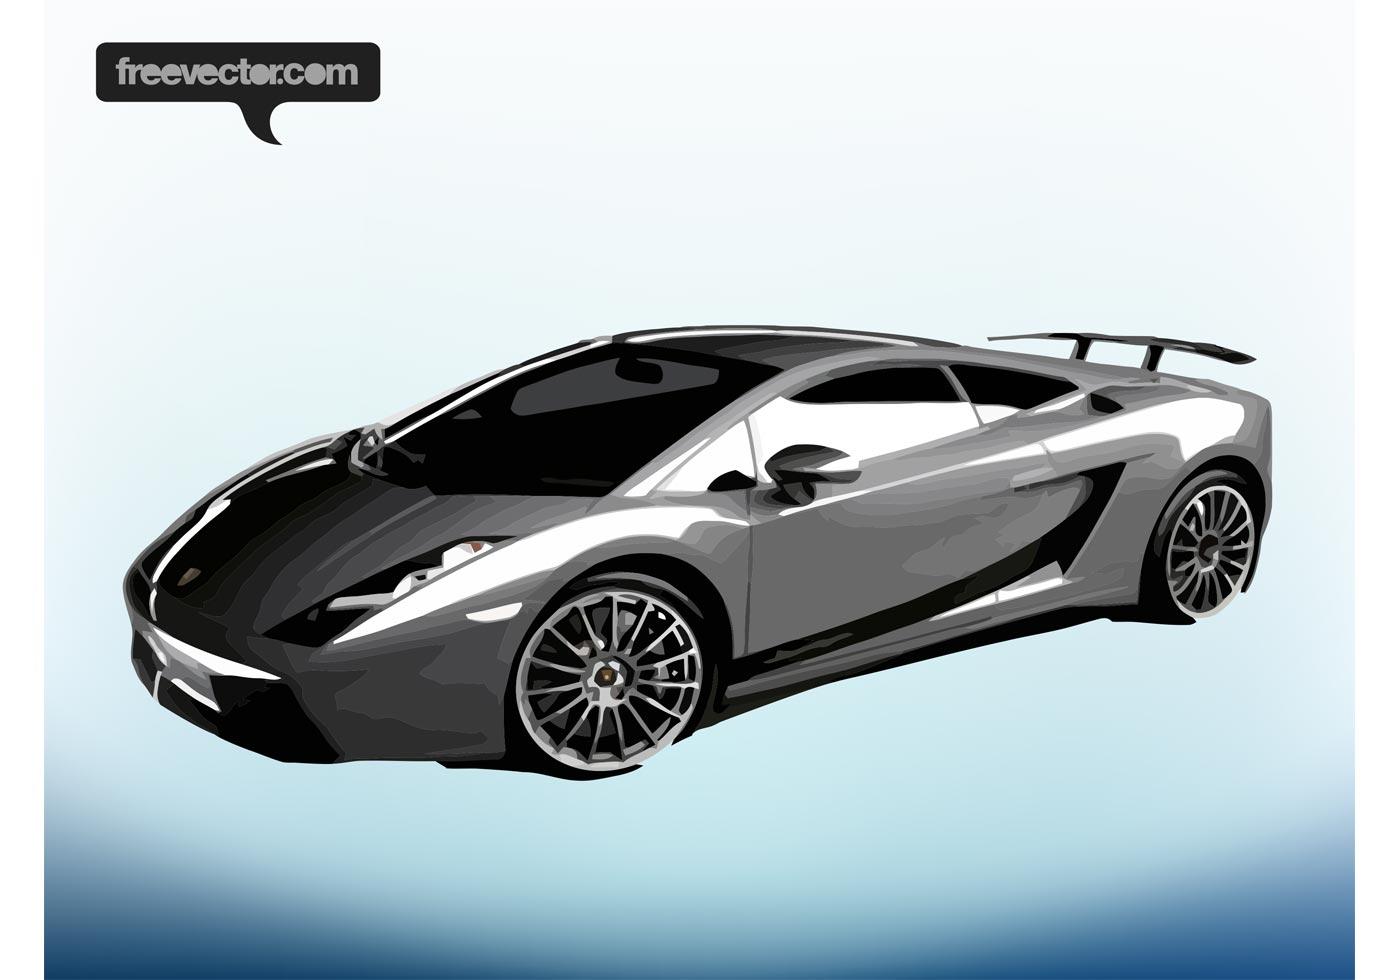 Lamborghini Gallardo Superleggera Download Free Vectors